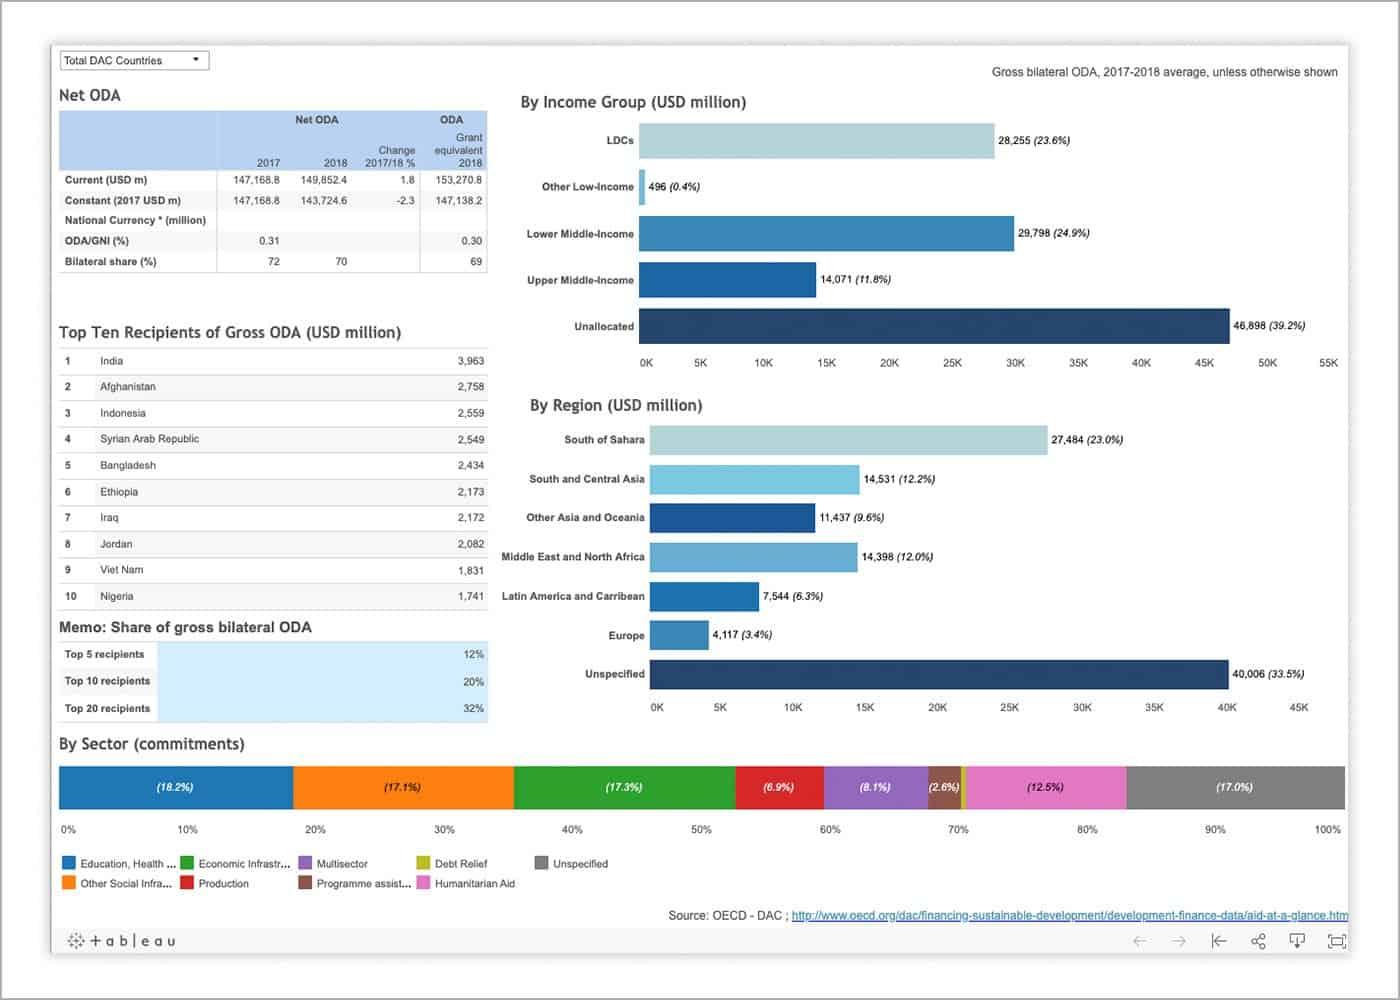 oecd aid database